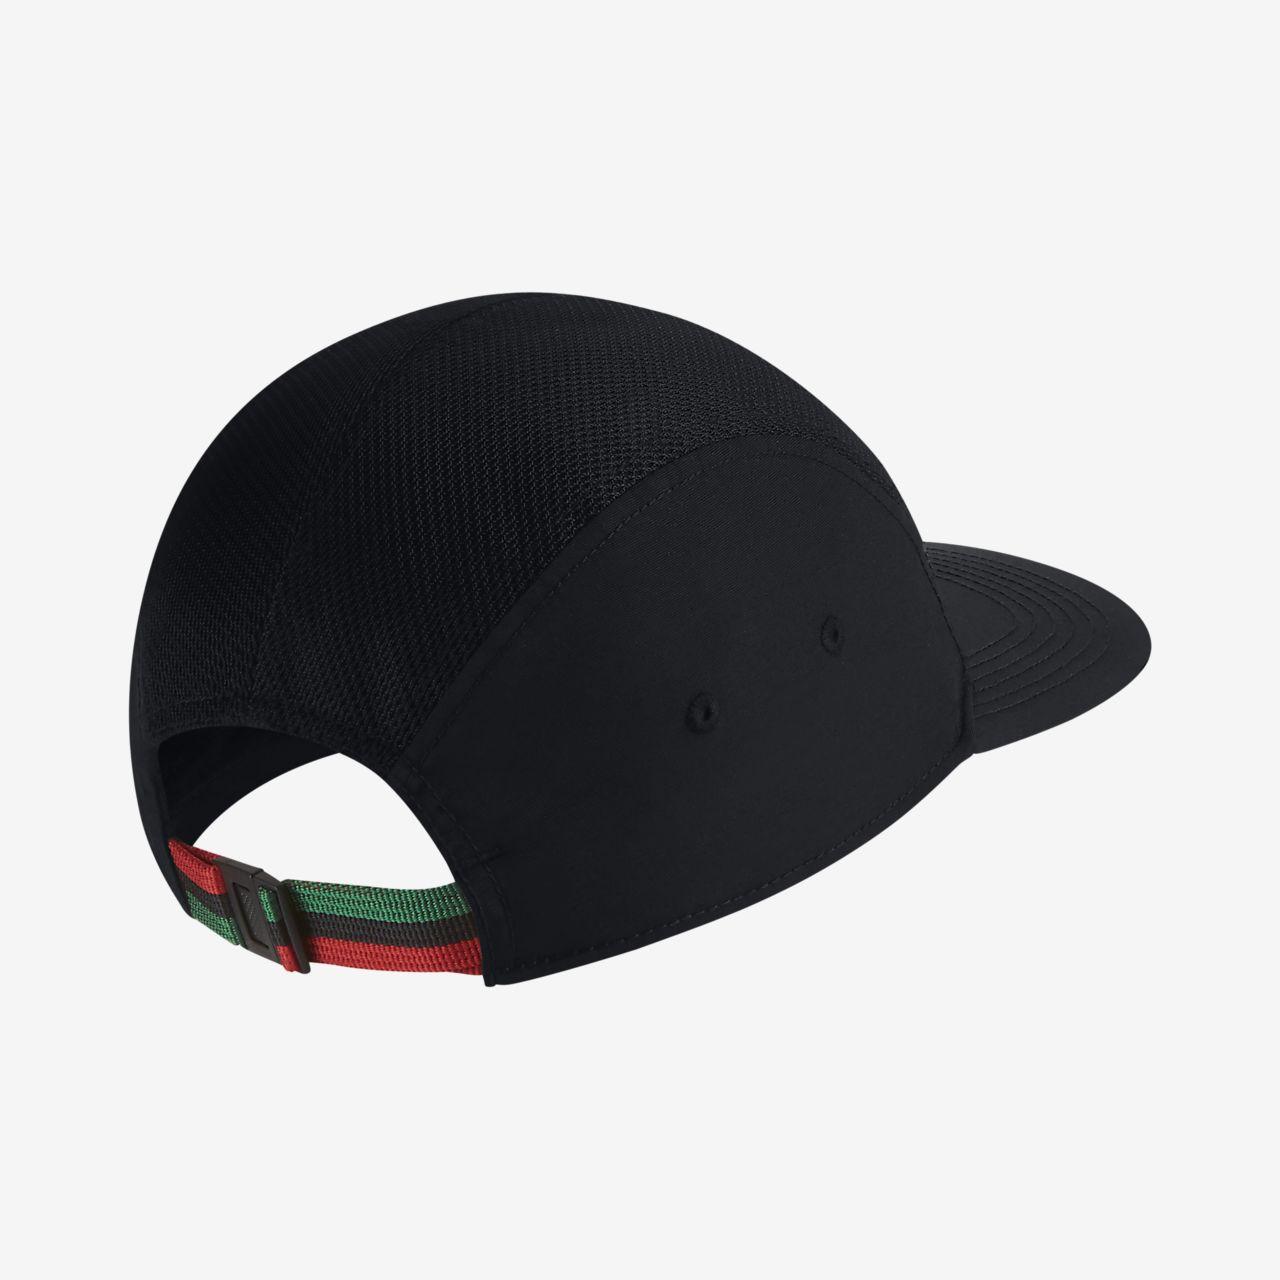 0d45c46f118db9 ... coupon code for jordan aw84 bhm adjustable hat dd201 06961